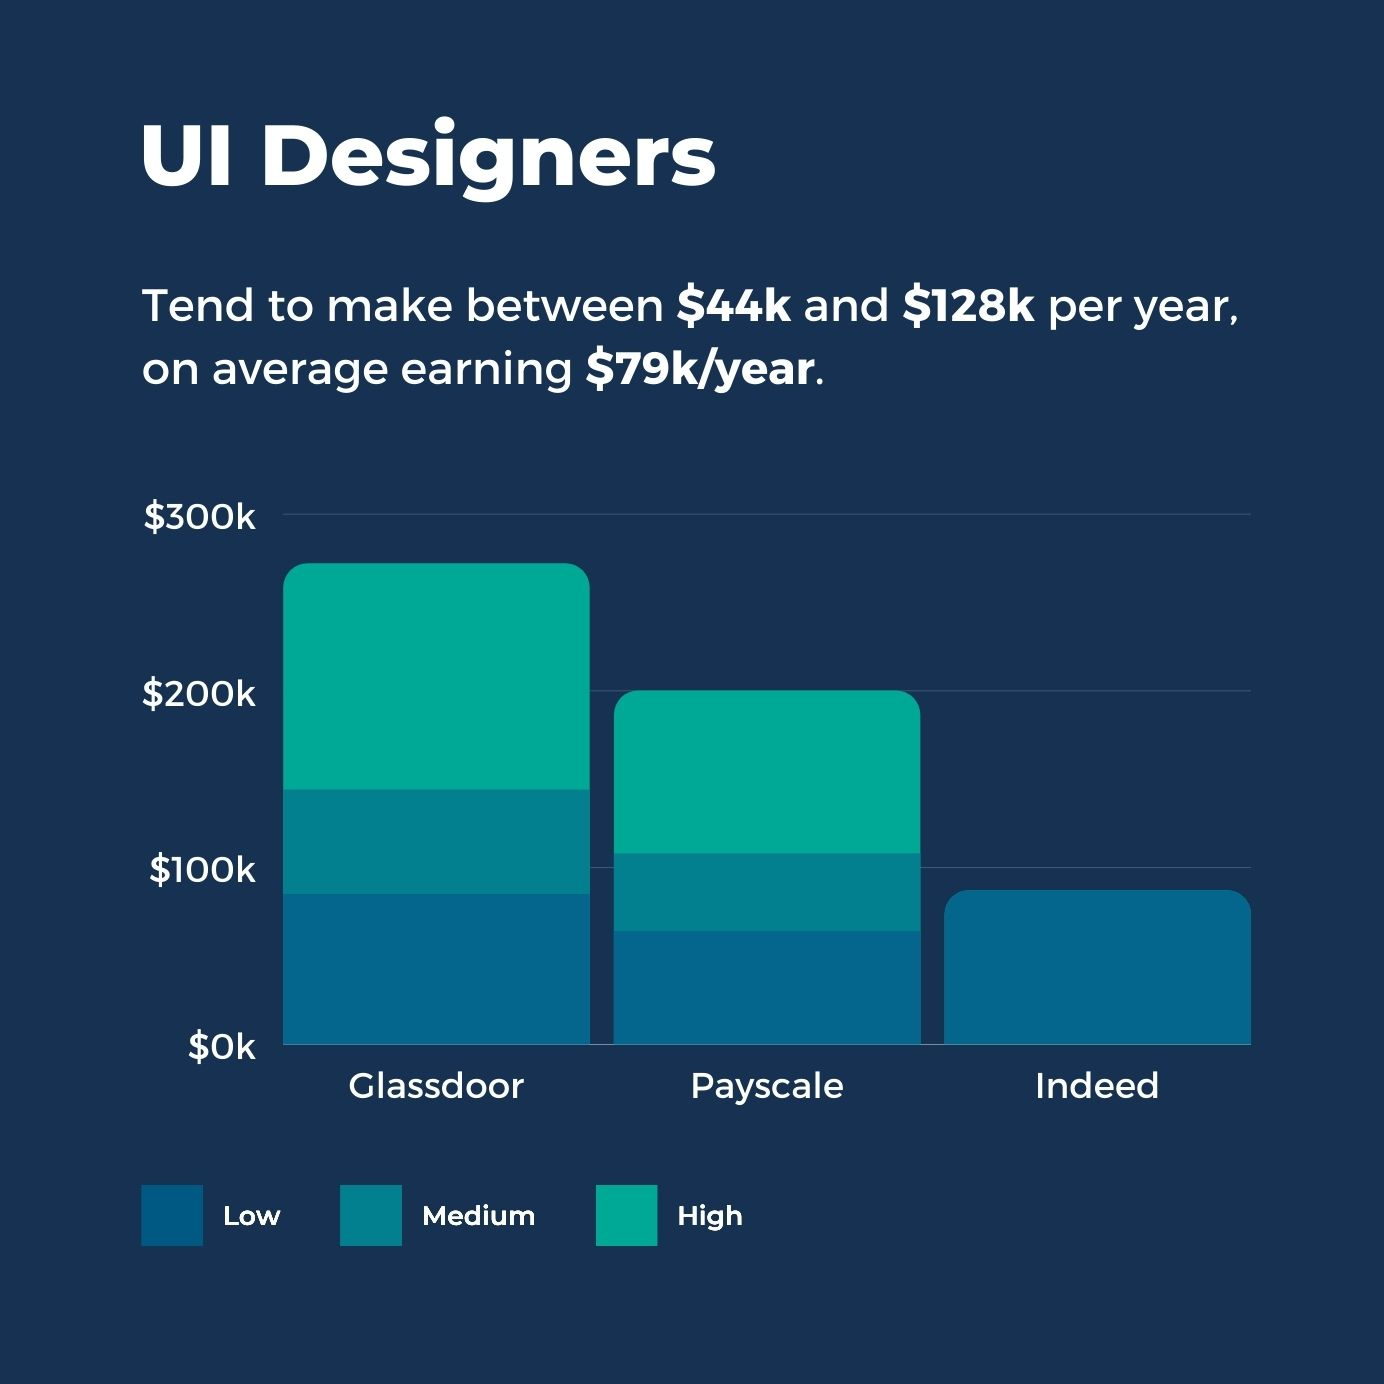 UI Designers Salaries